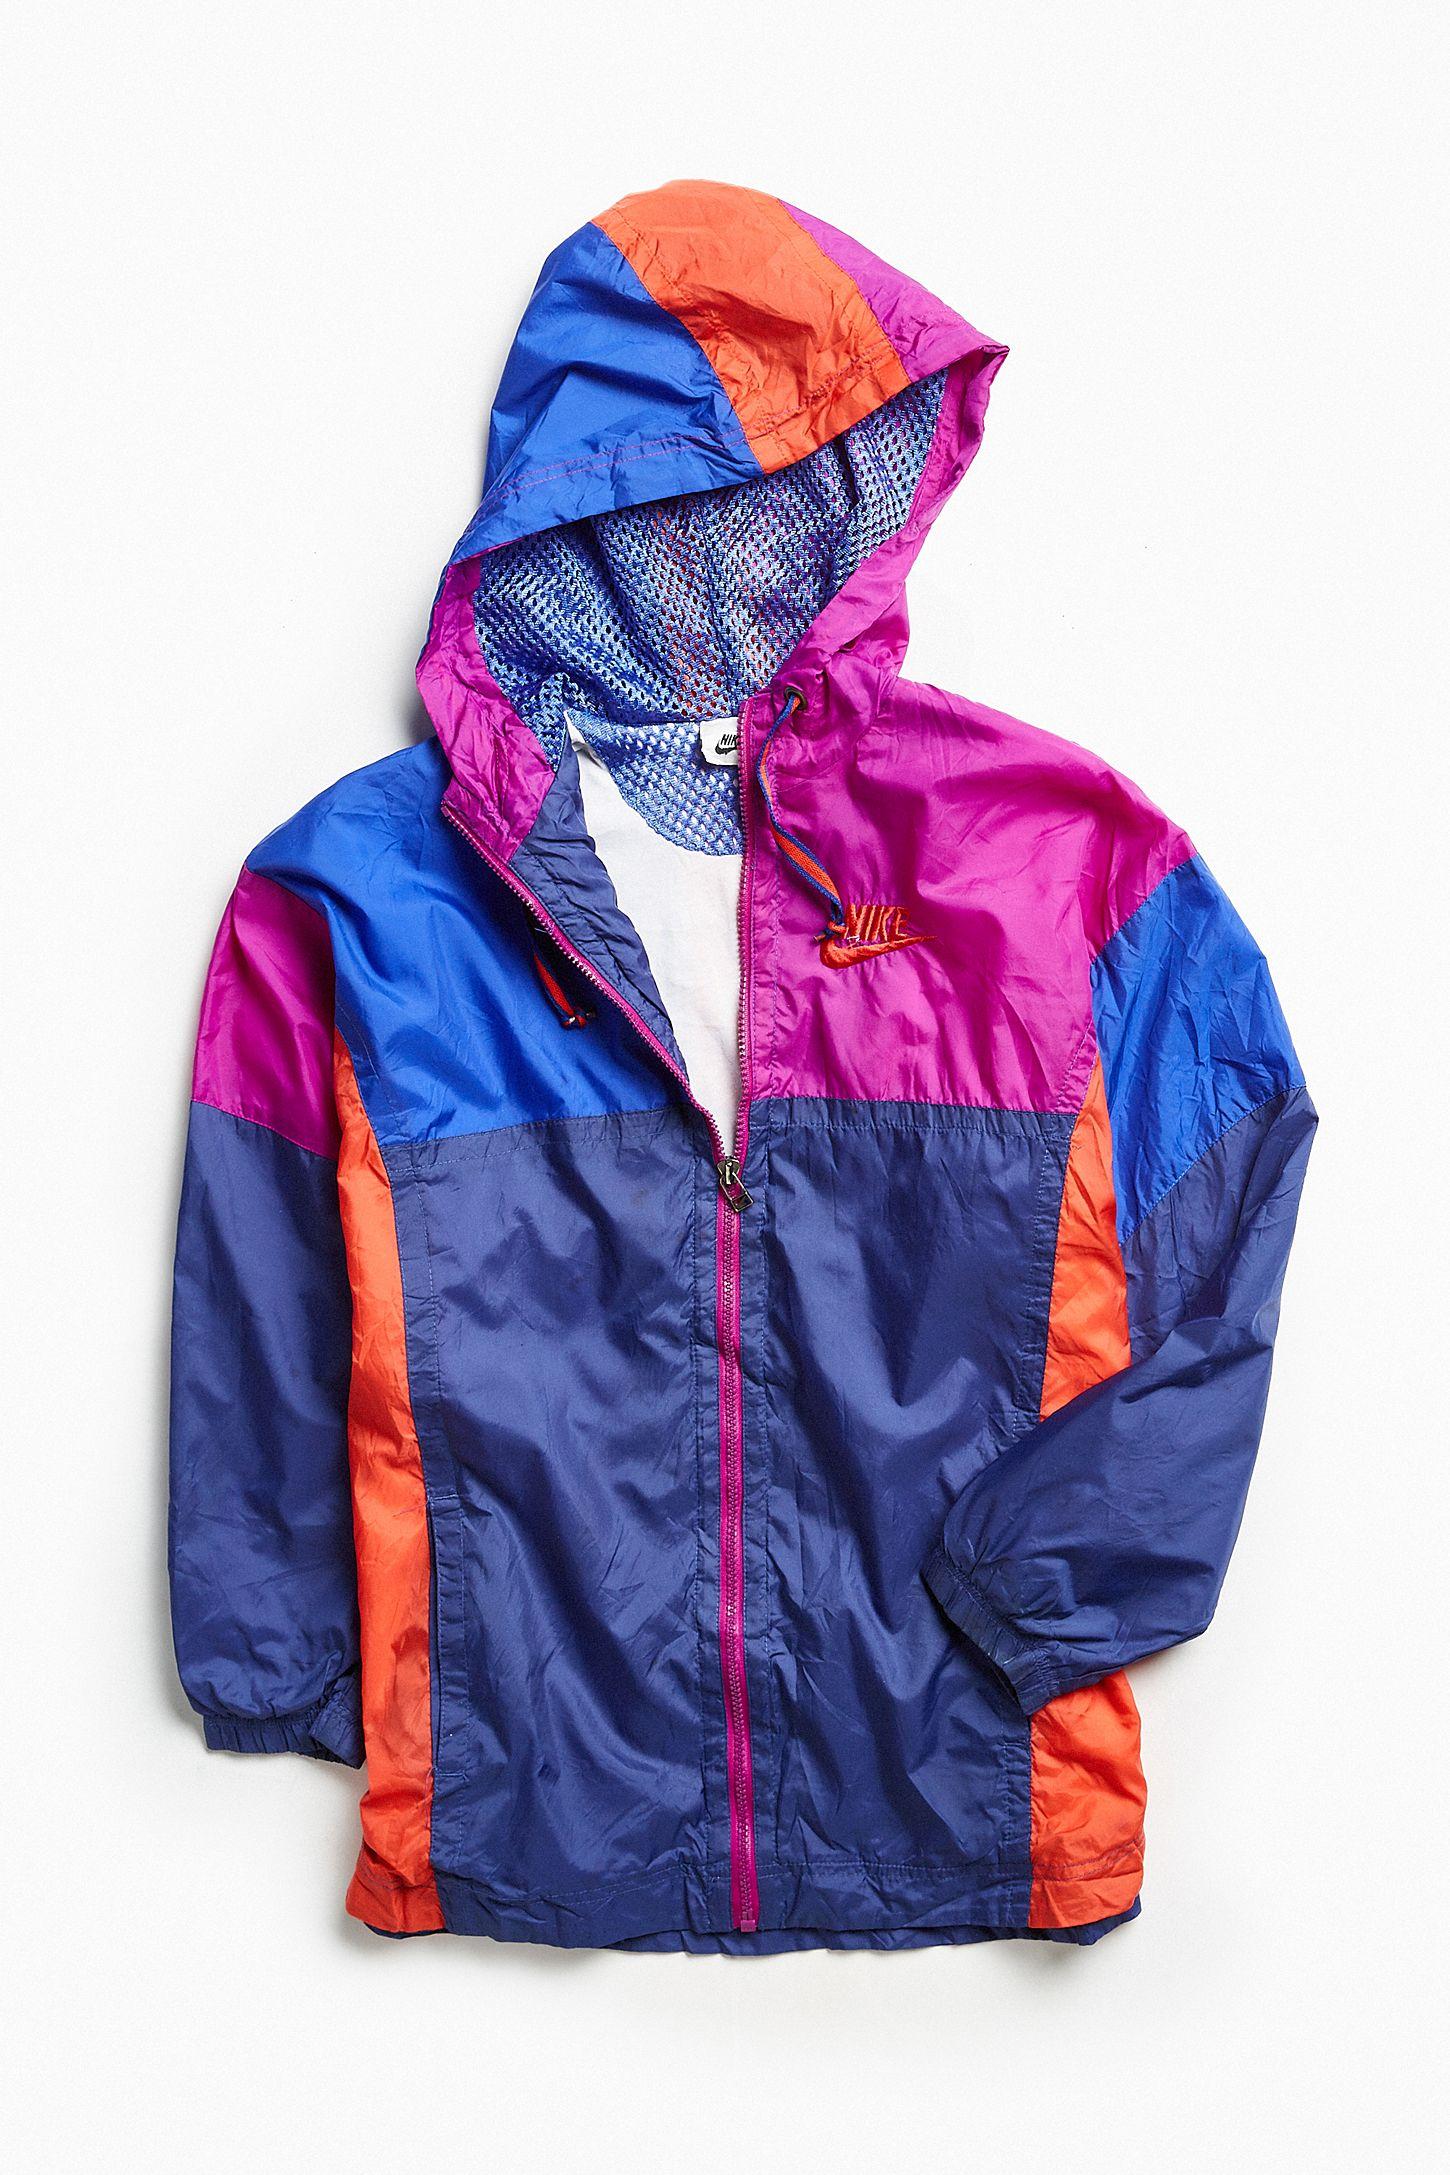 c2d82dc16941 Vintage Nike Blue Purple Red  90s Prep Sport Windbreaker Jacket ...